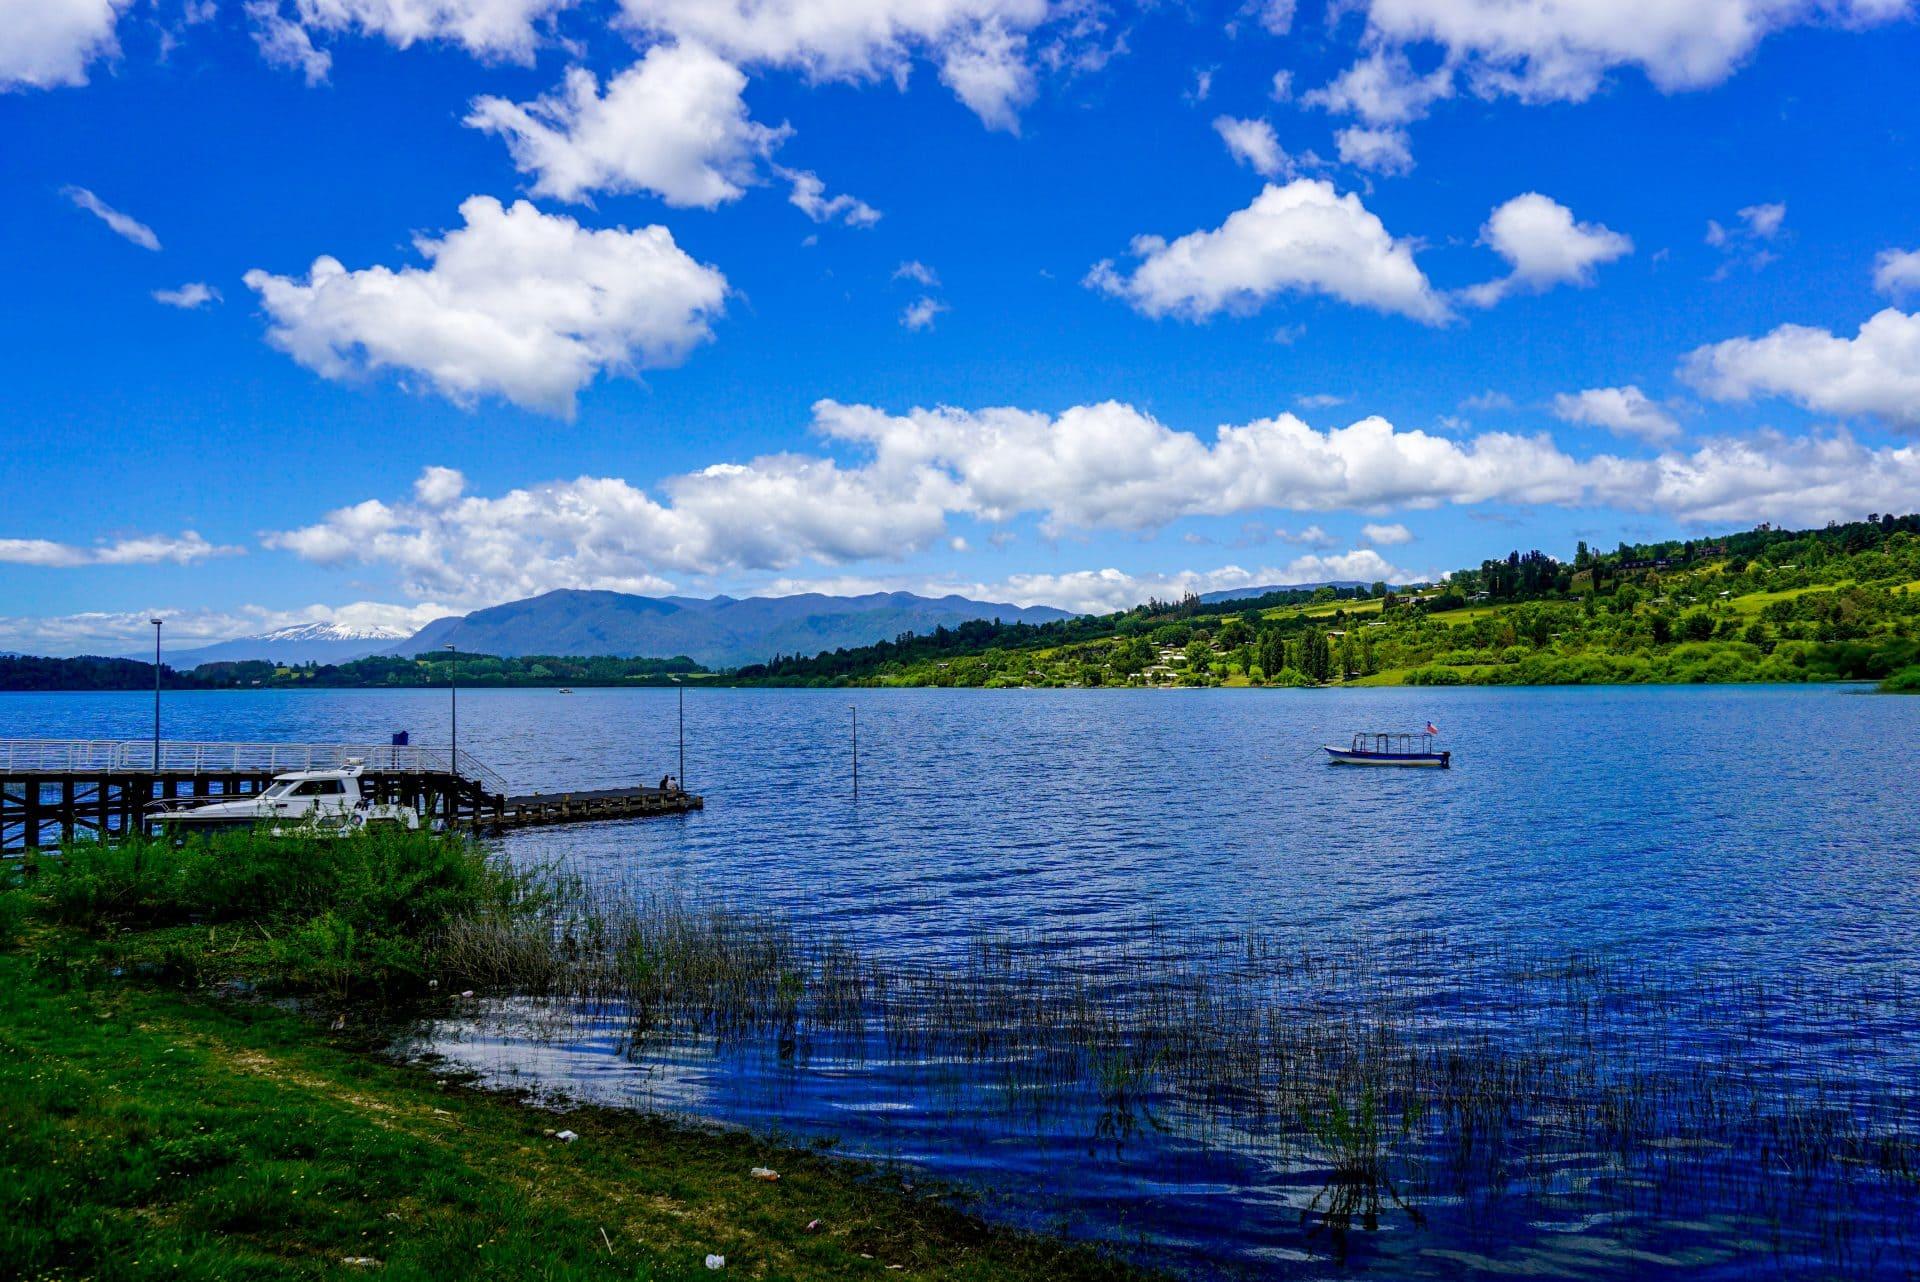 Lake Panguipulli, Chile - Experiencing the Globe